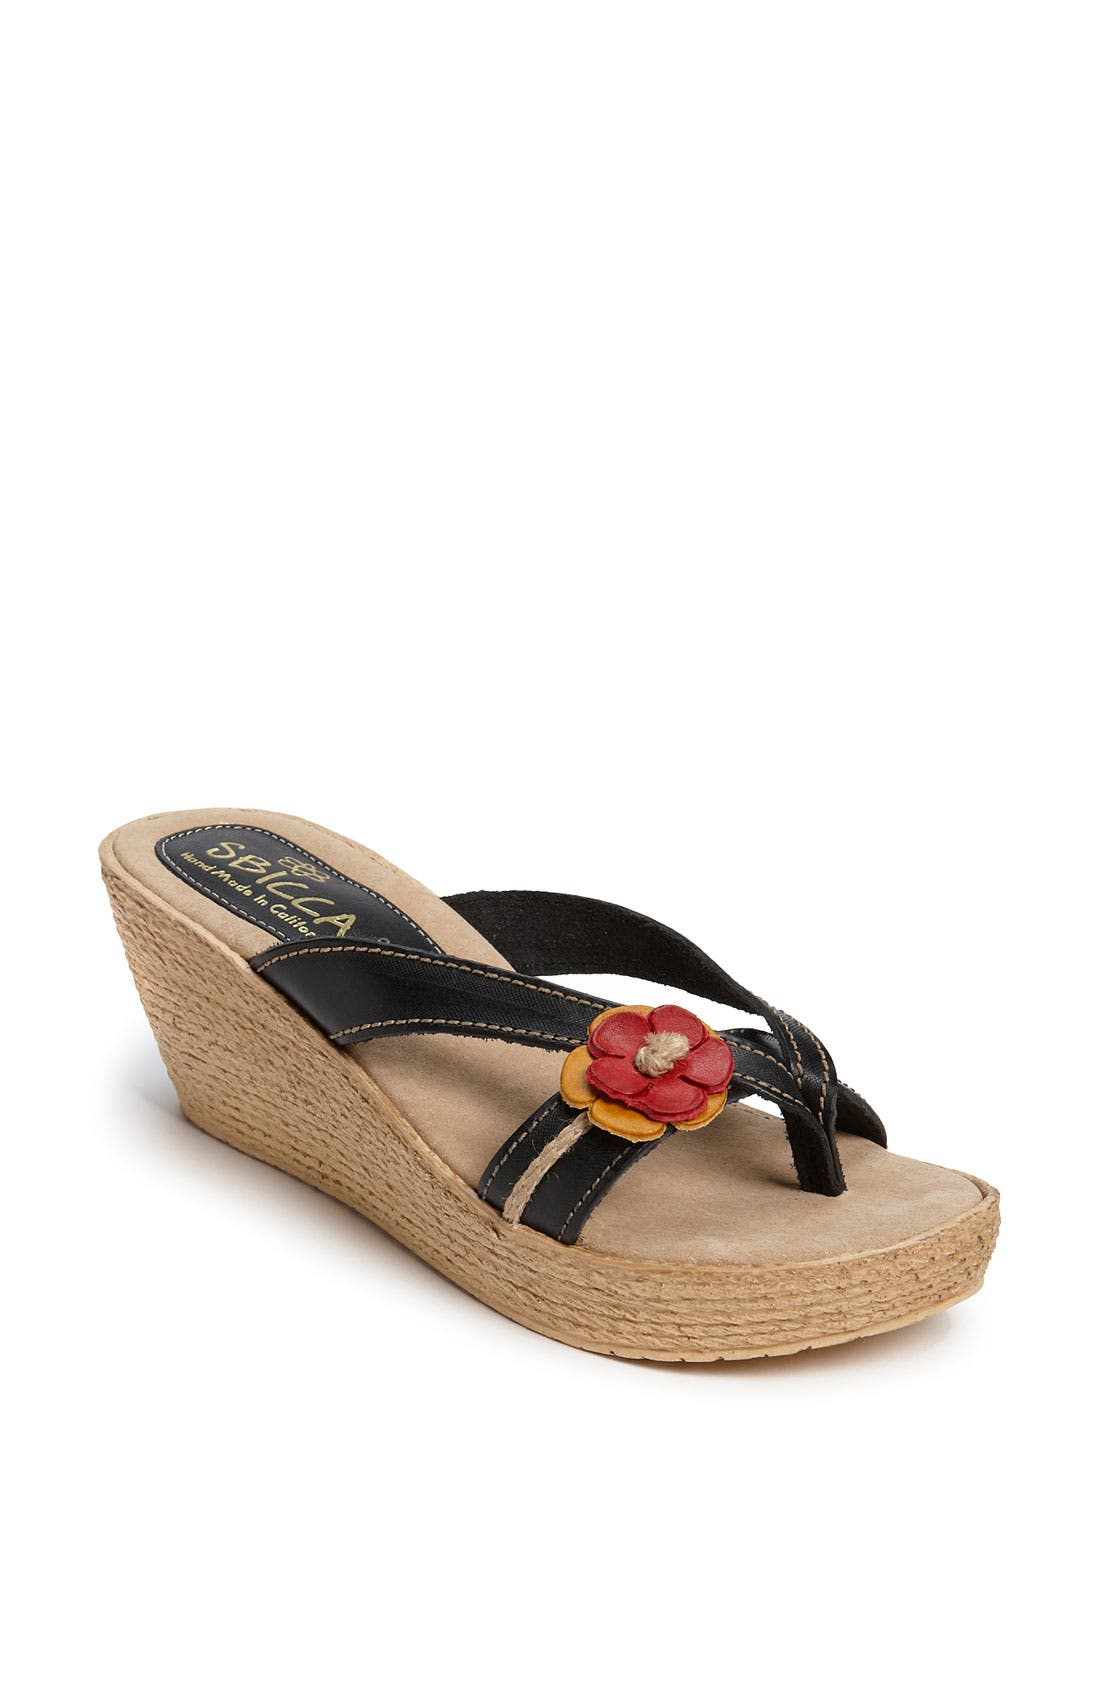 Alternate Image 1 Selected - Sbicca 'Amity' Sandal